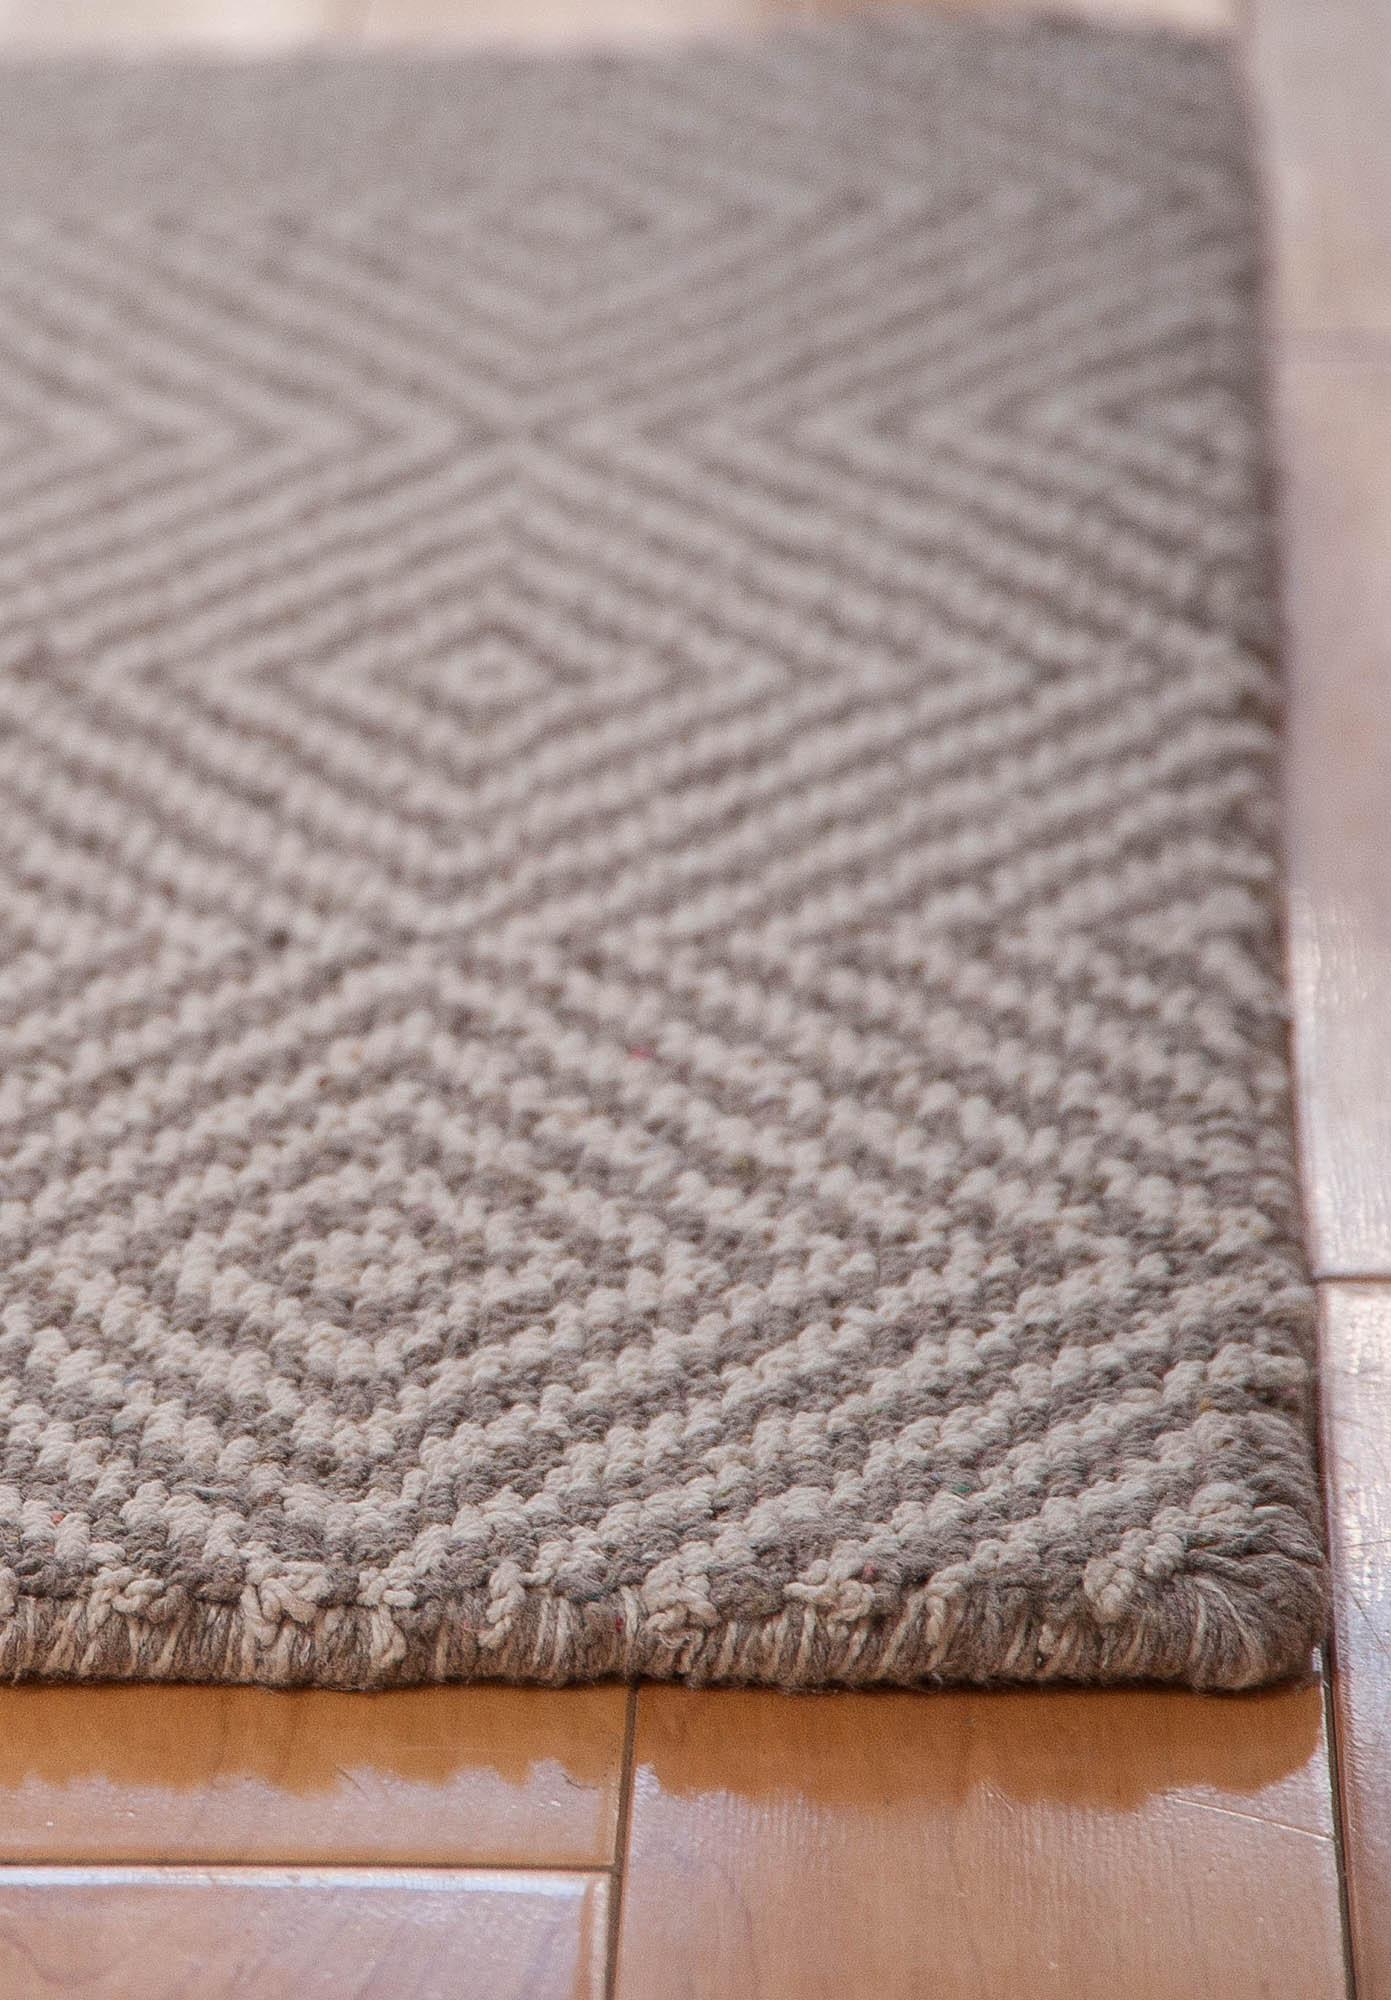 Kensington Taupe Natural Eco Cotton Loom Hooked Rug Hook